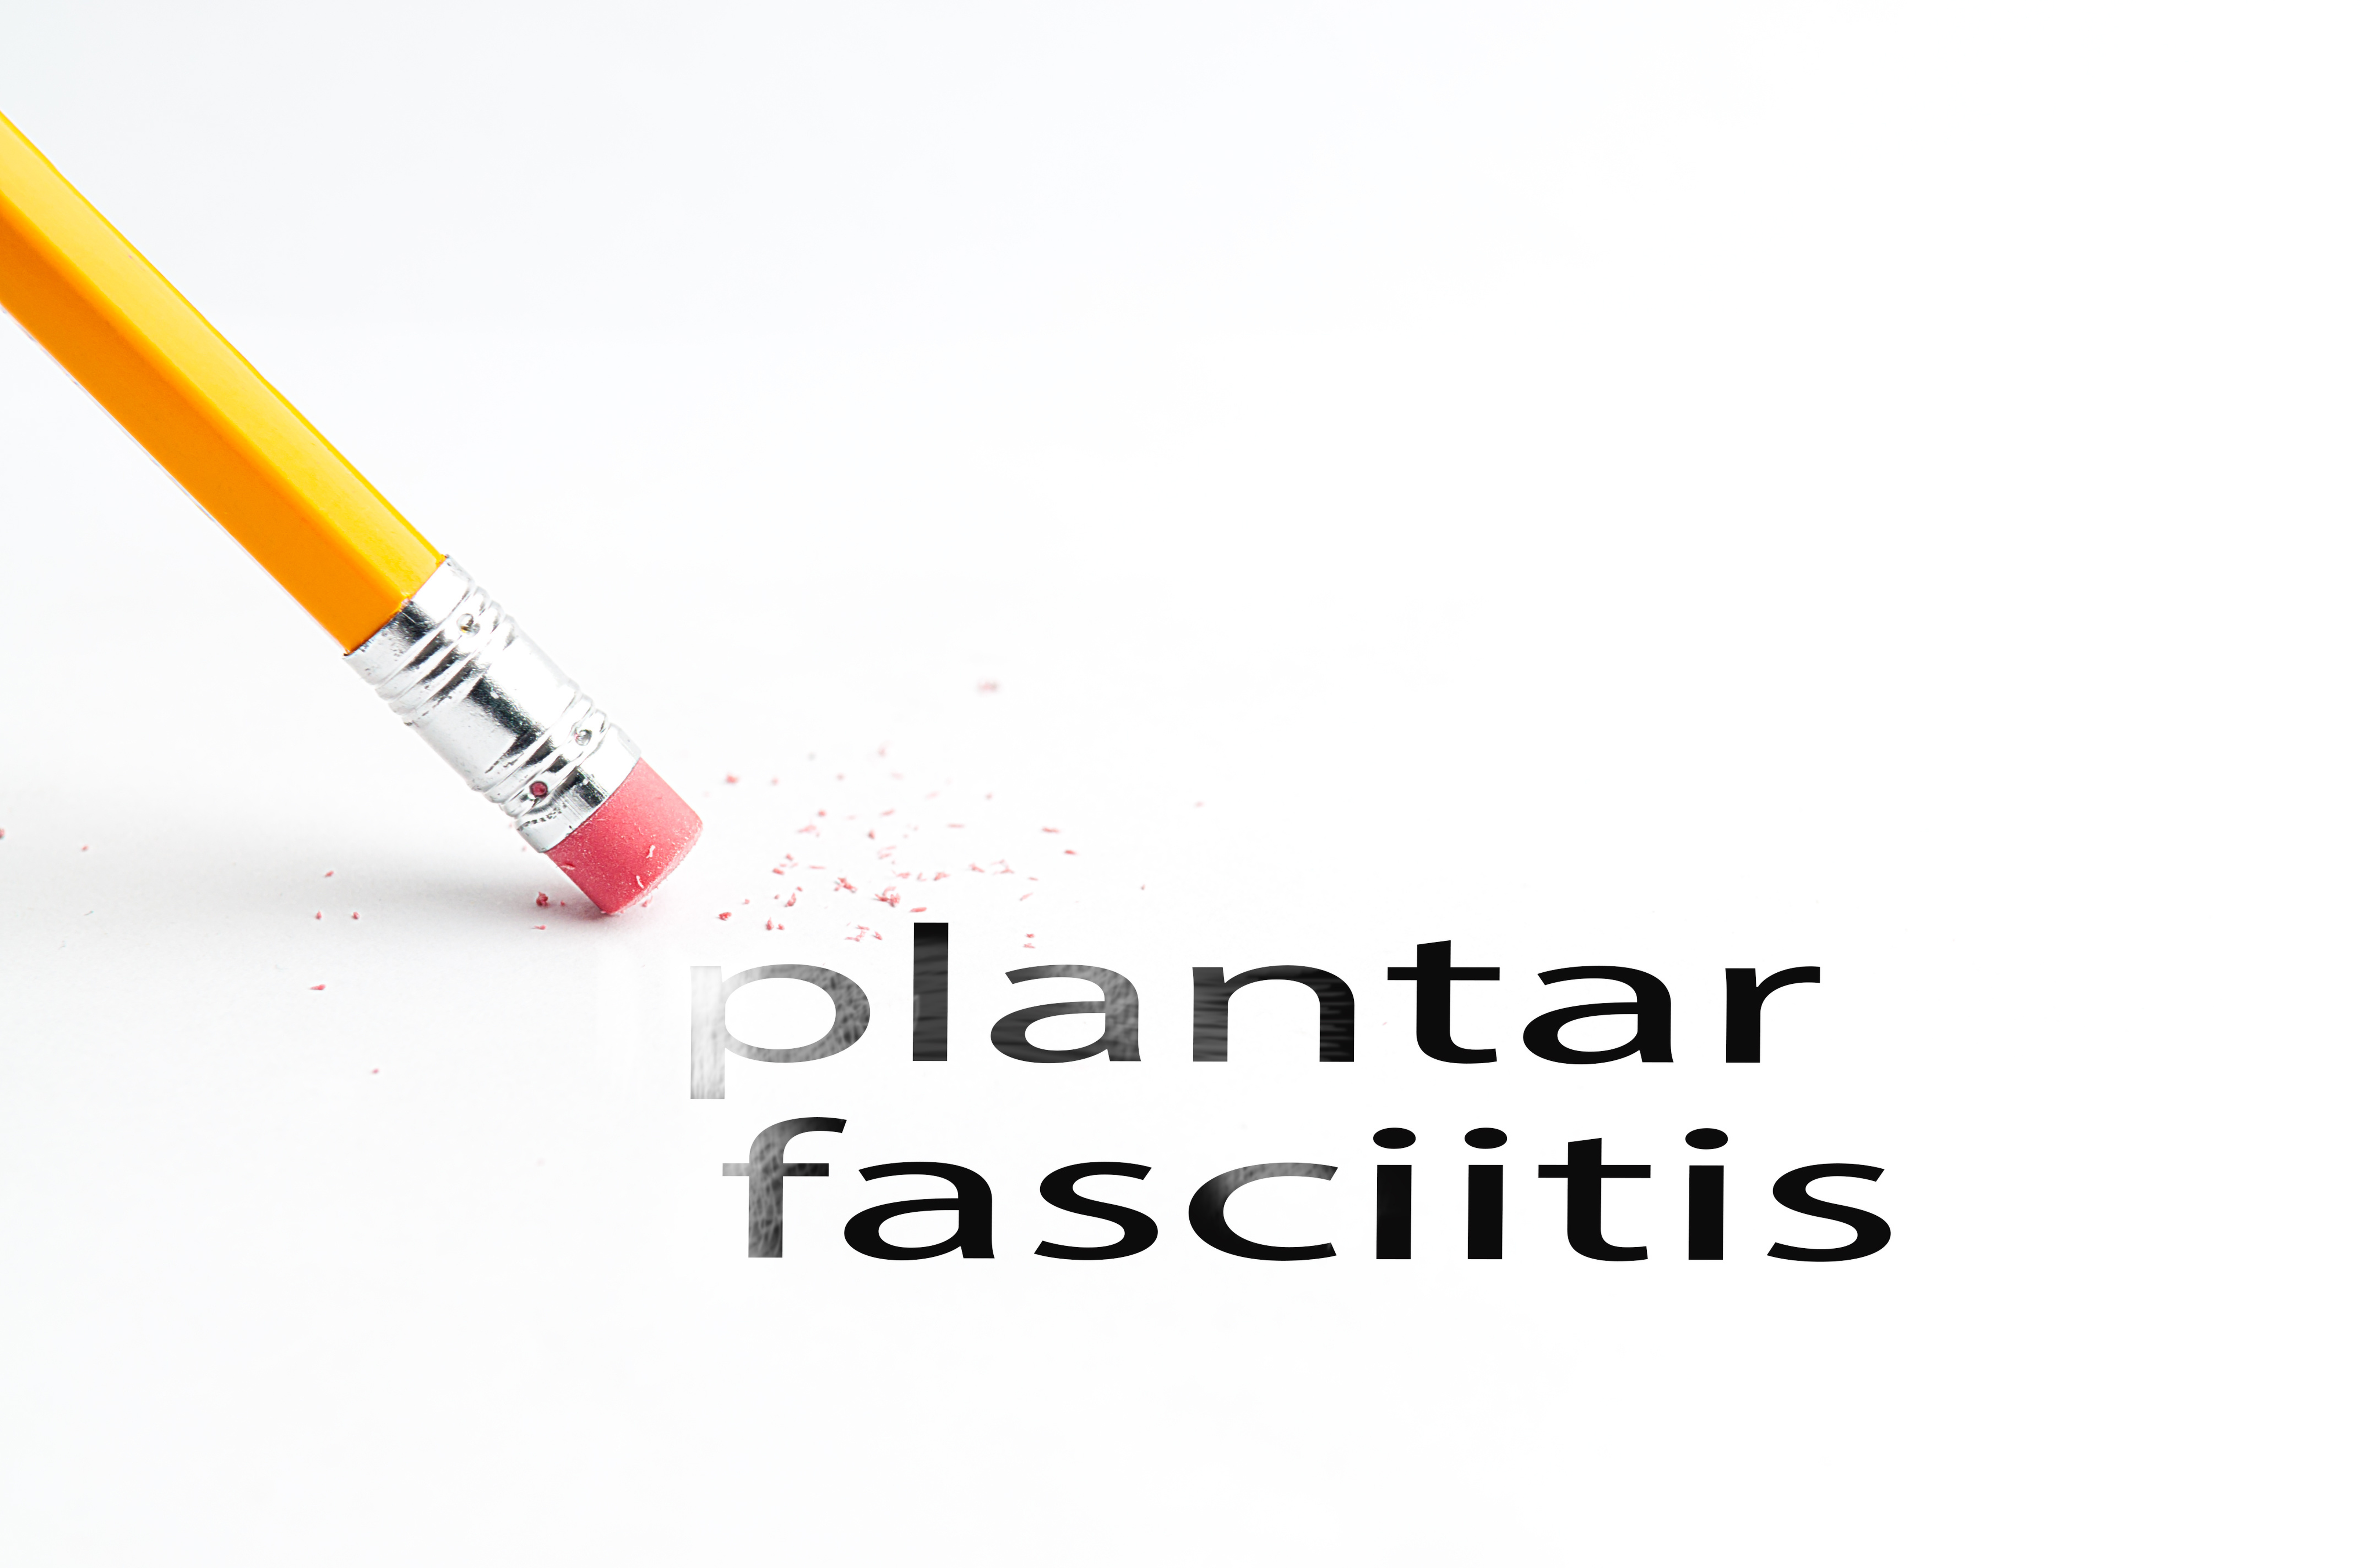 Closeup of pencil eraser and black plantar fasciitis text. Plantar fasciitis. Pencil with eraser.